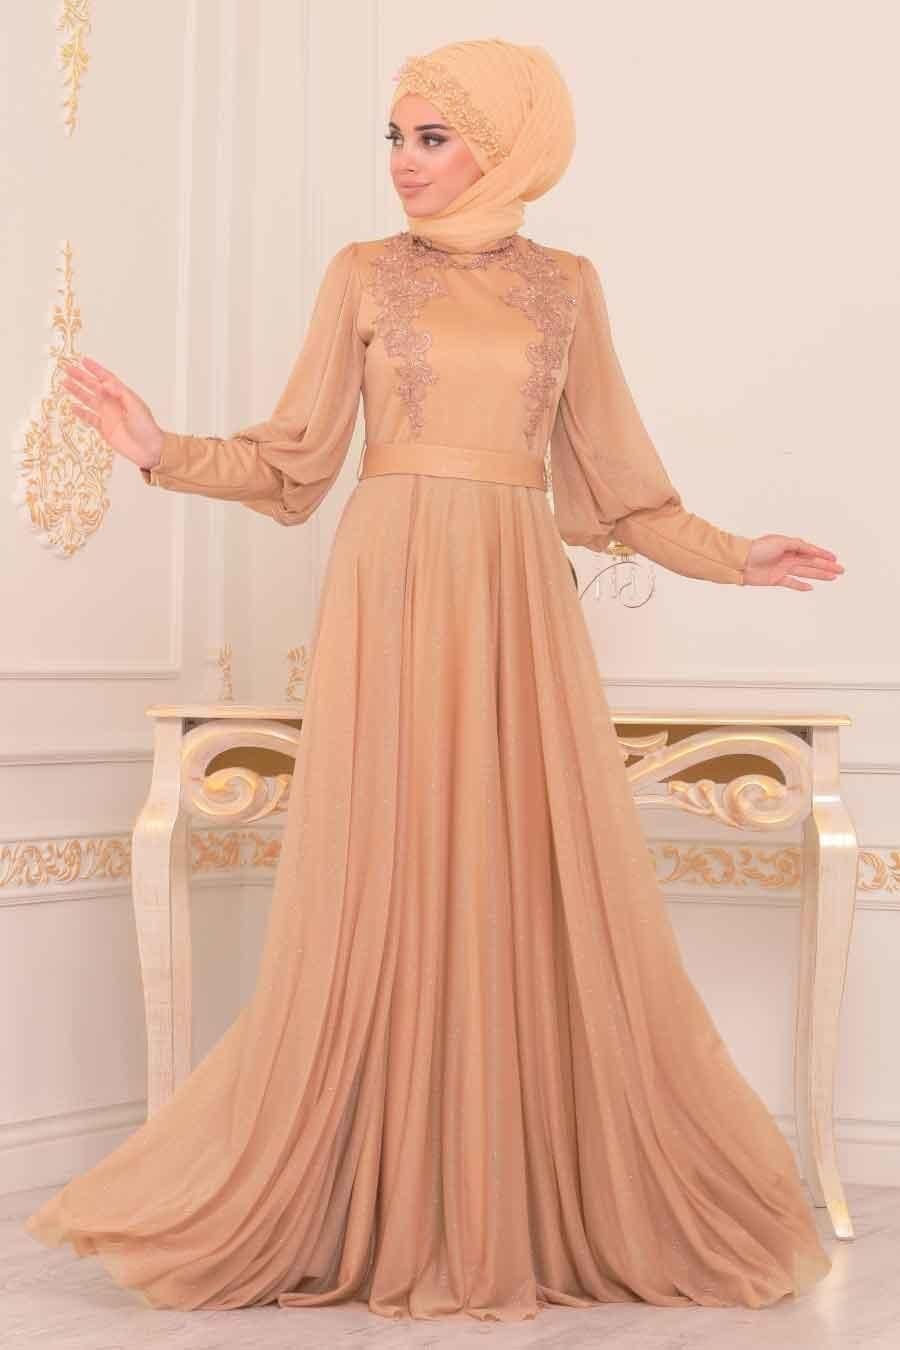 Tesetturlu Abiye Elbise Balon Kol Gold Tesettur Abiye Elbise 39270gold Tesetturisland Com The Dress Elbise Sik Kiyafetler